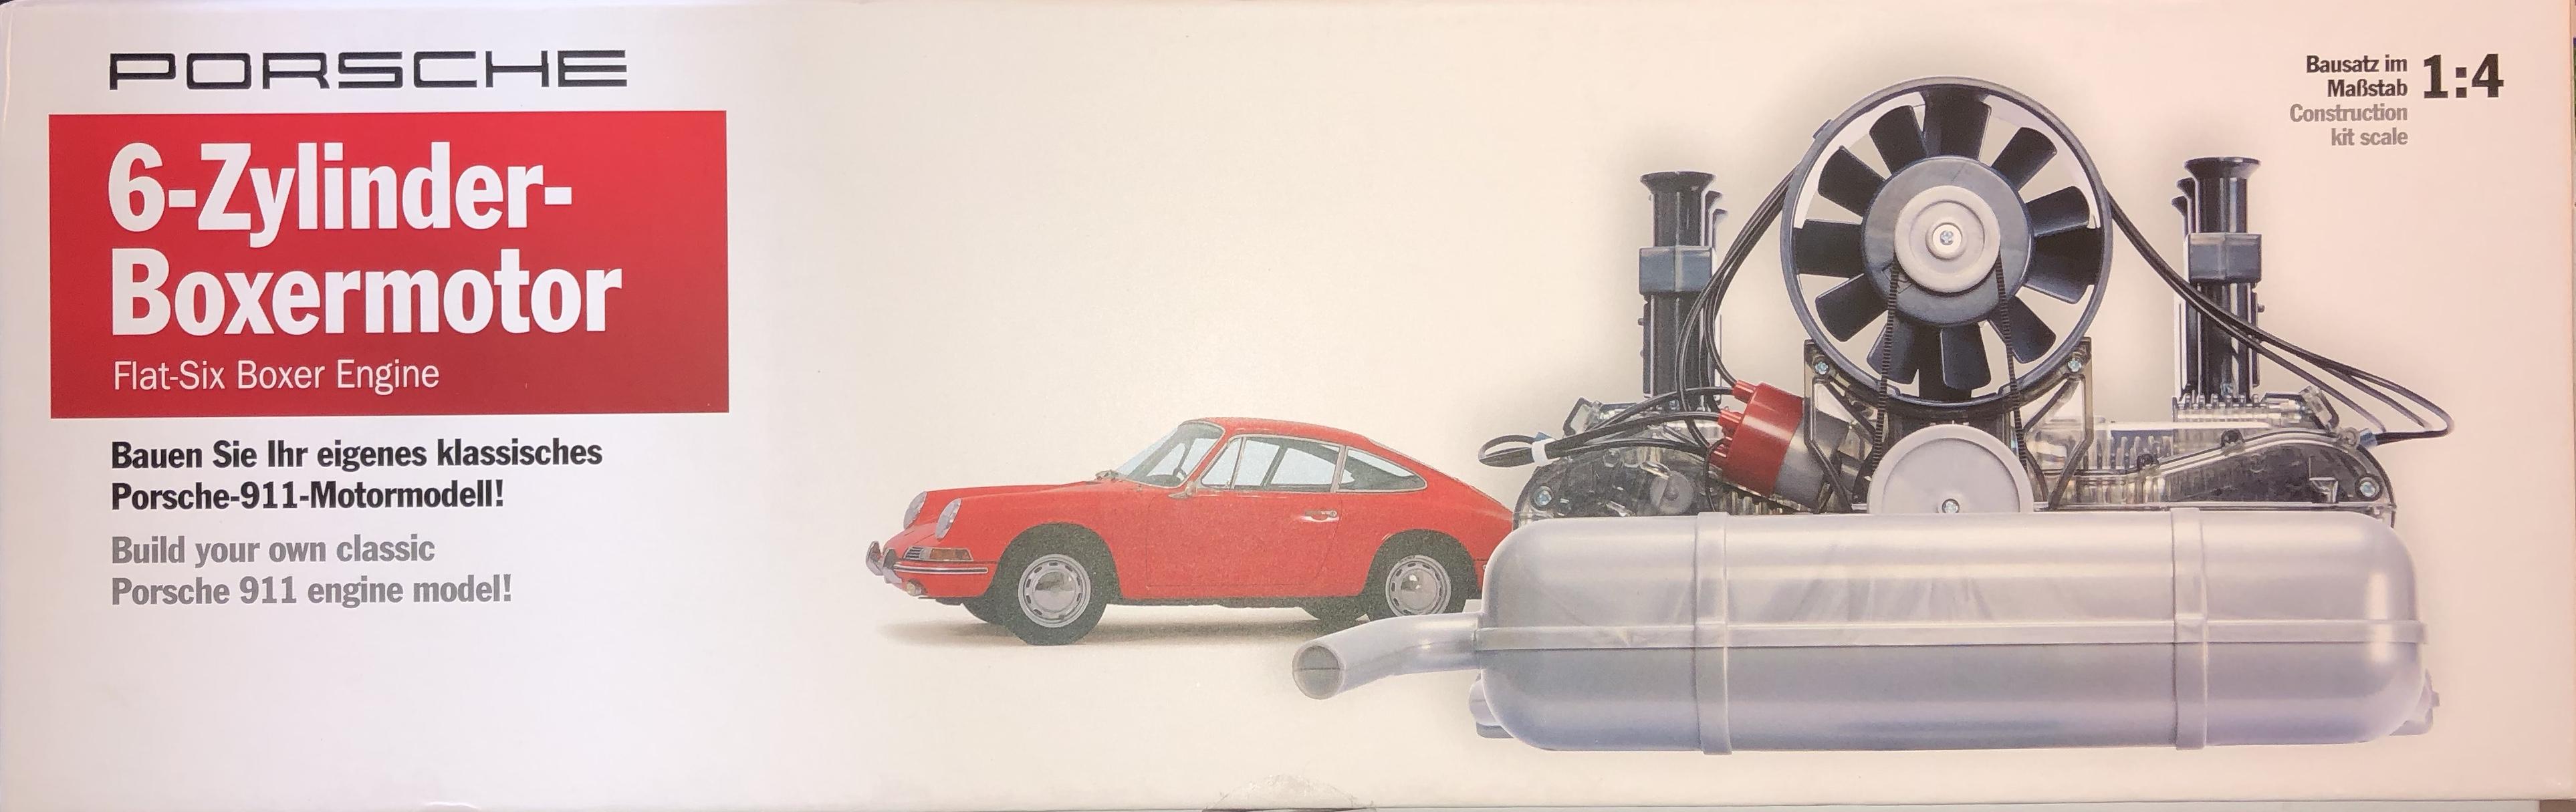 porsche carrera rennmotor 1953 typ 547 bausatz. Black Bedroom Furniture Sets. Home Design Ideas